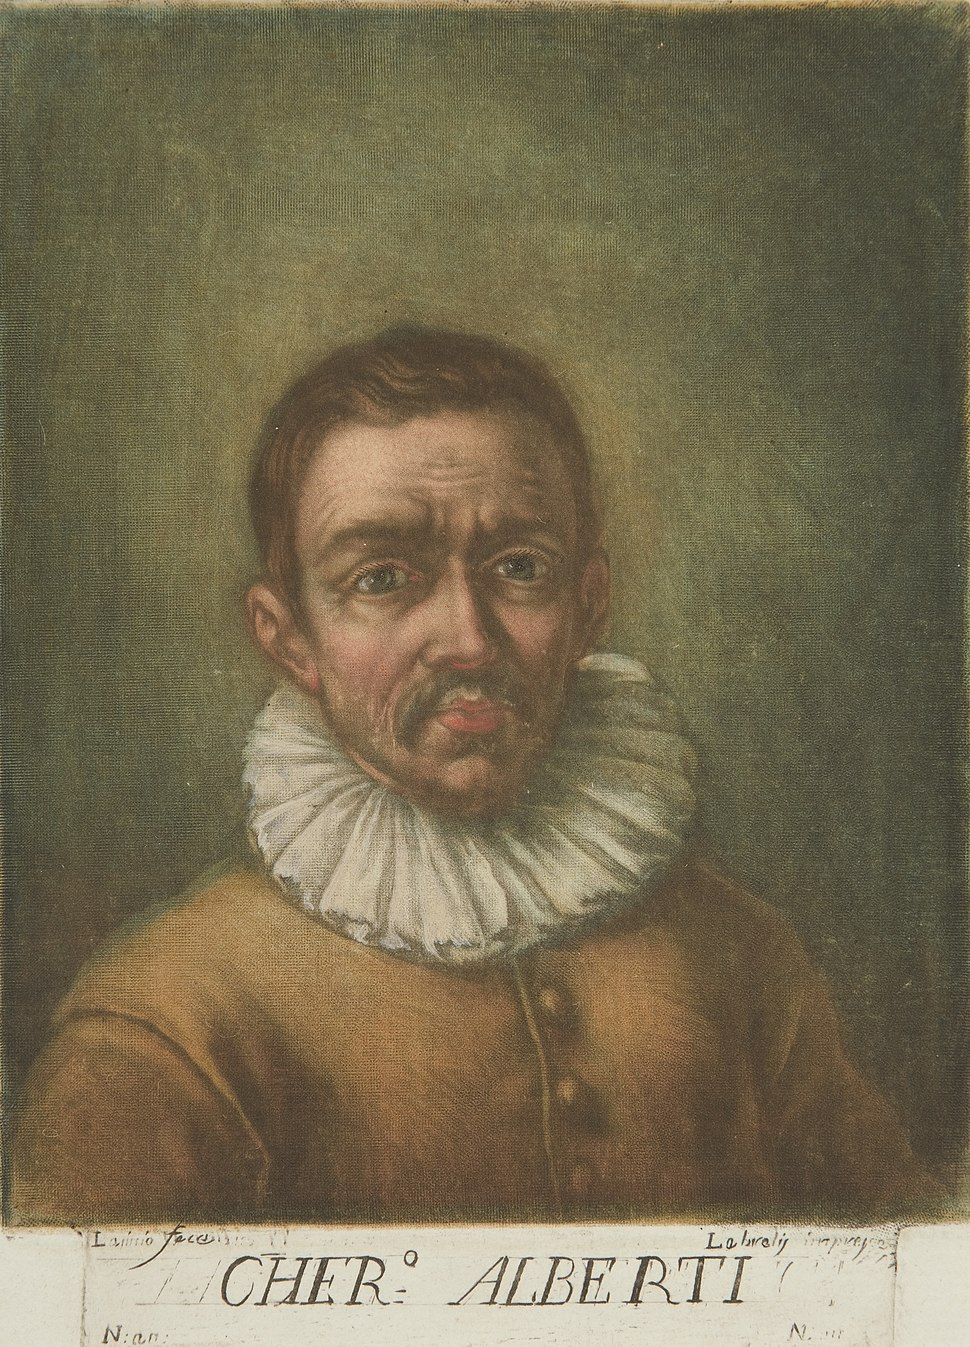 Portrait of Cherubini Alberti